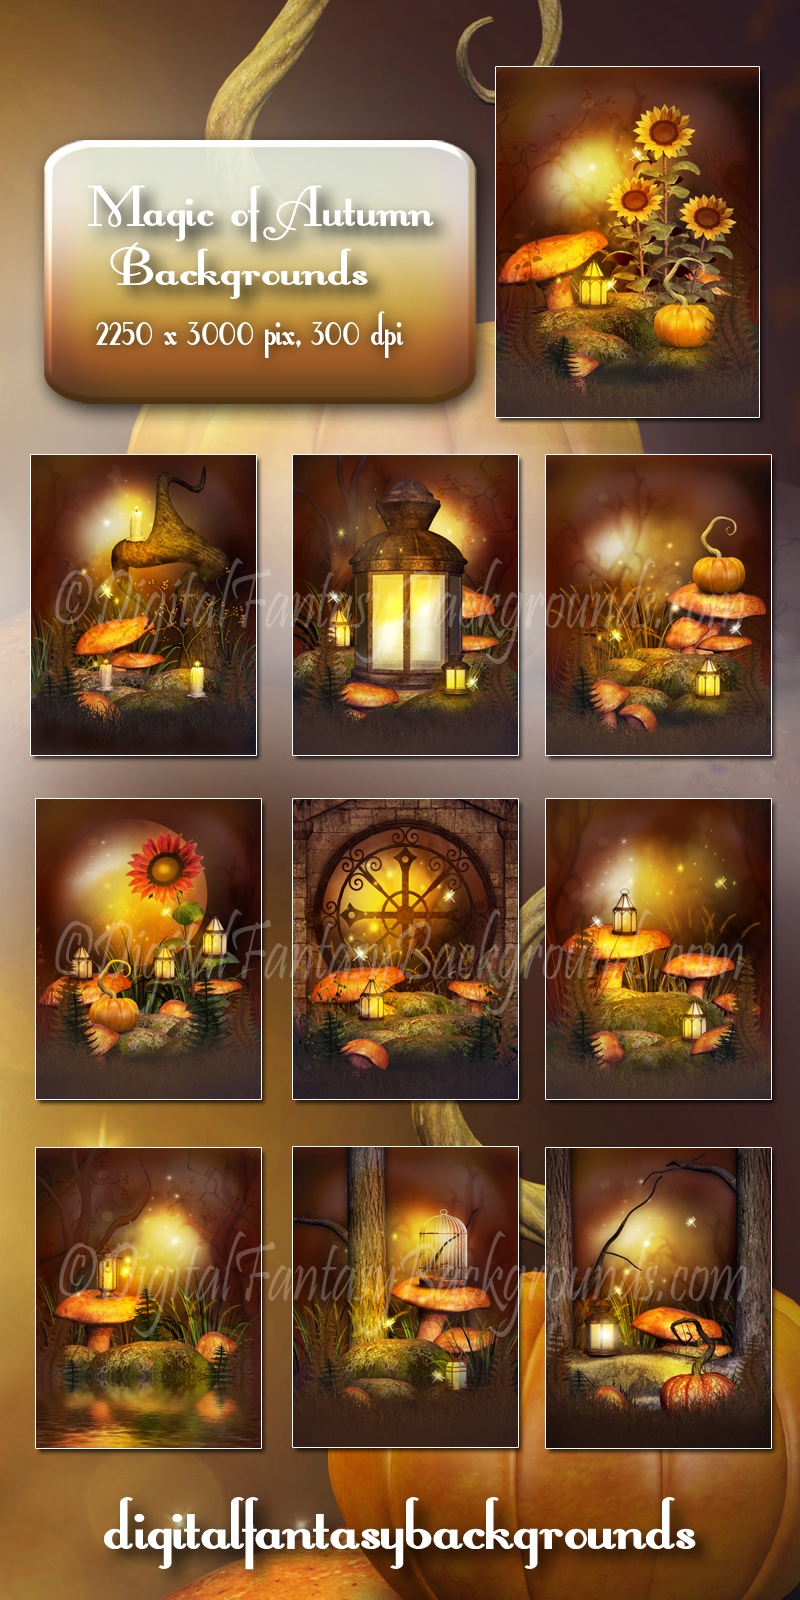 Magic_of_Autumn_promo_assnezana_copy.jpg